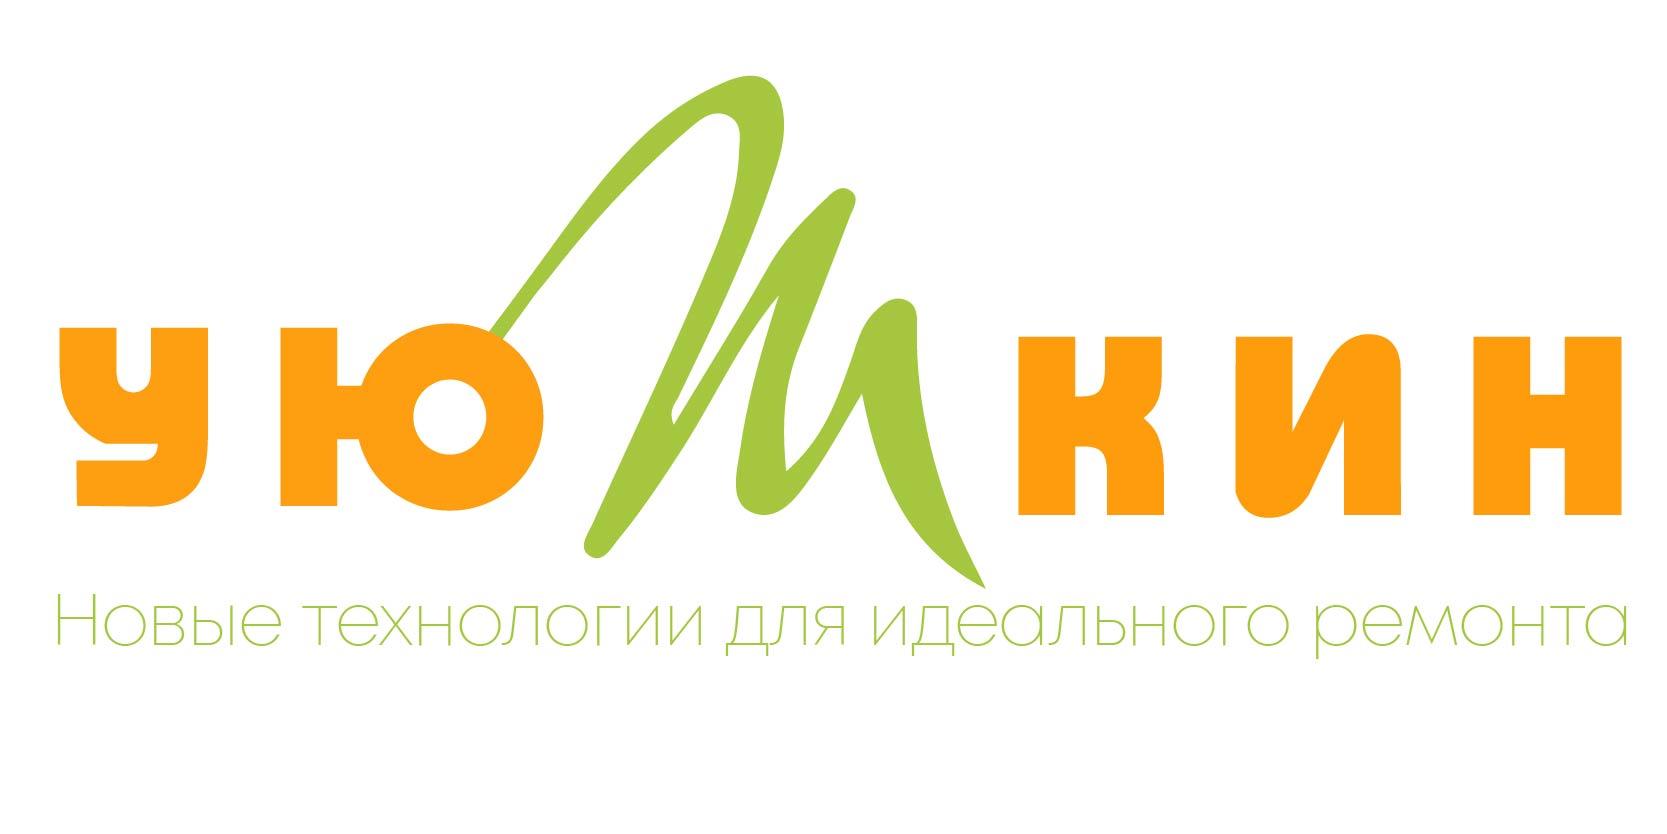 Создание логотипа и стиля сайта фото f_4035c61358c7979b.jpg